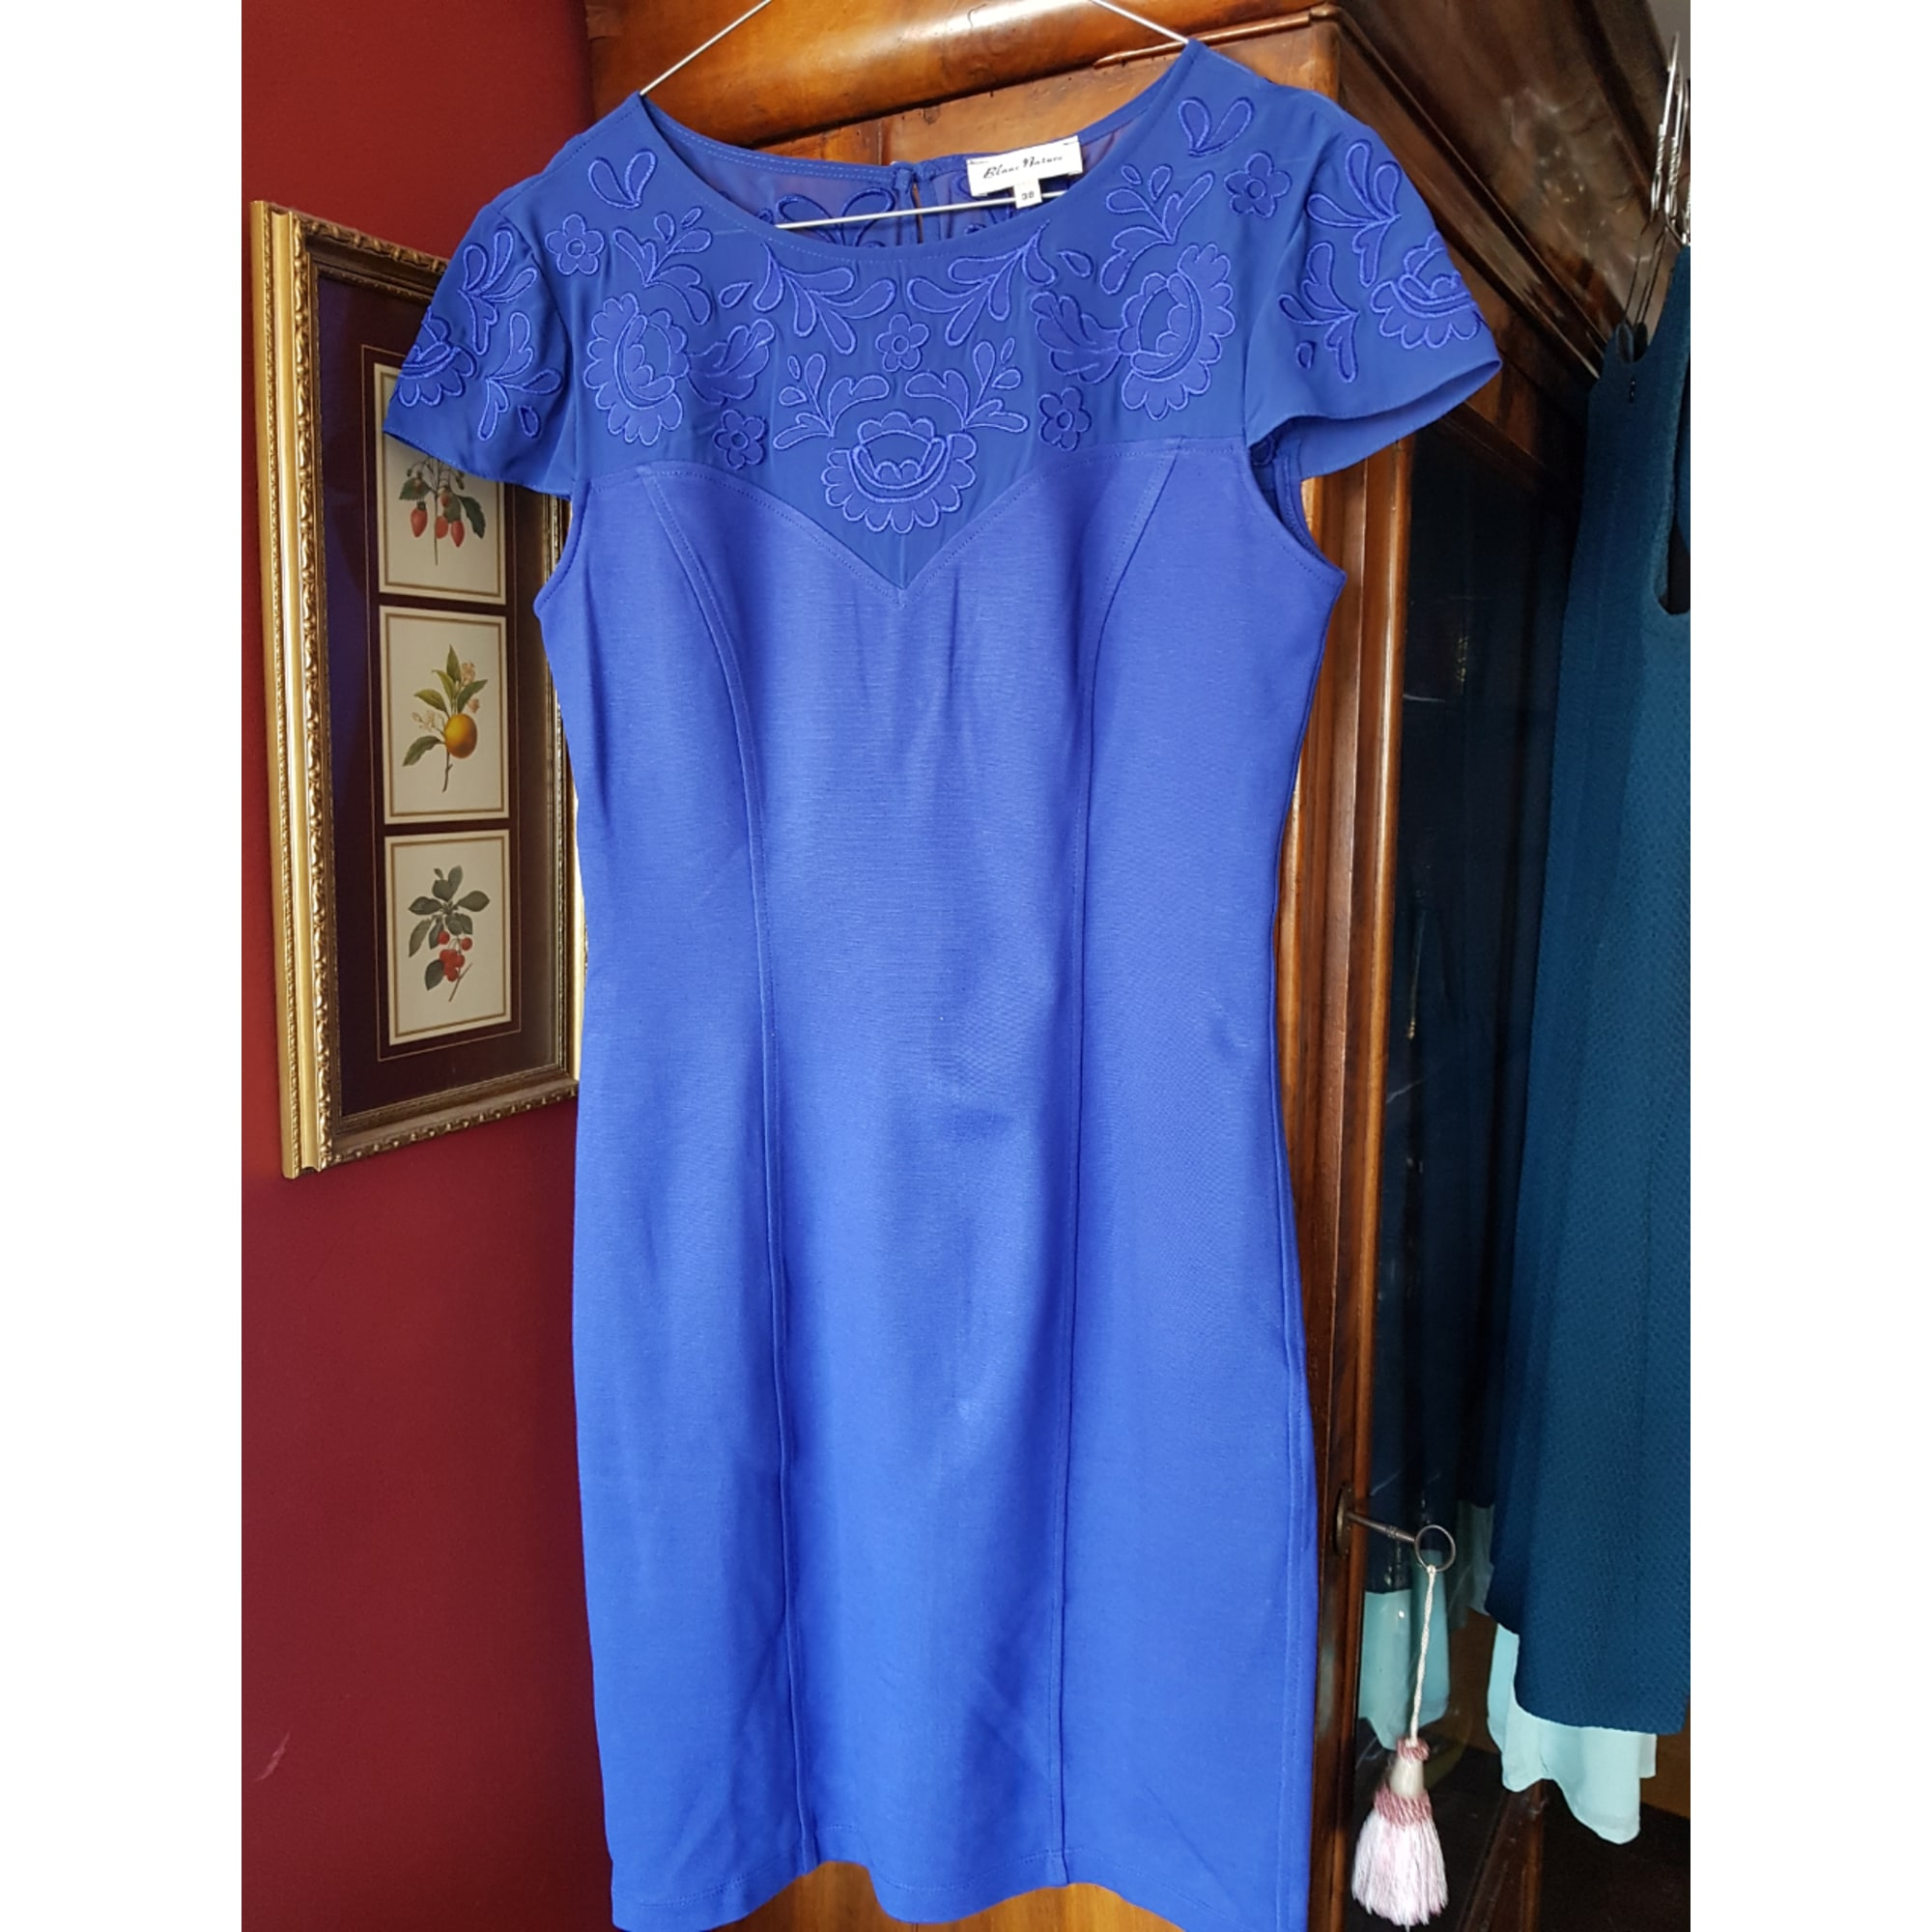 Robe courte BLANC NATURE Bleu, bleu marine, bleu turquoise